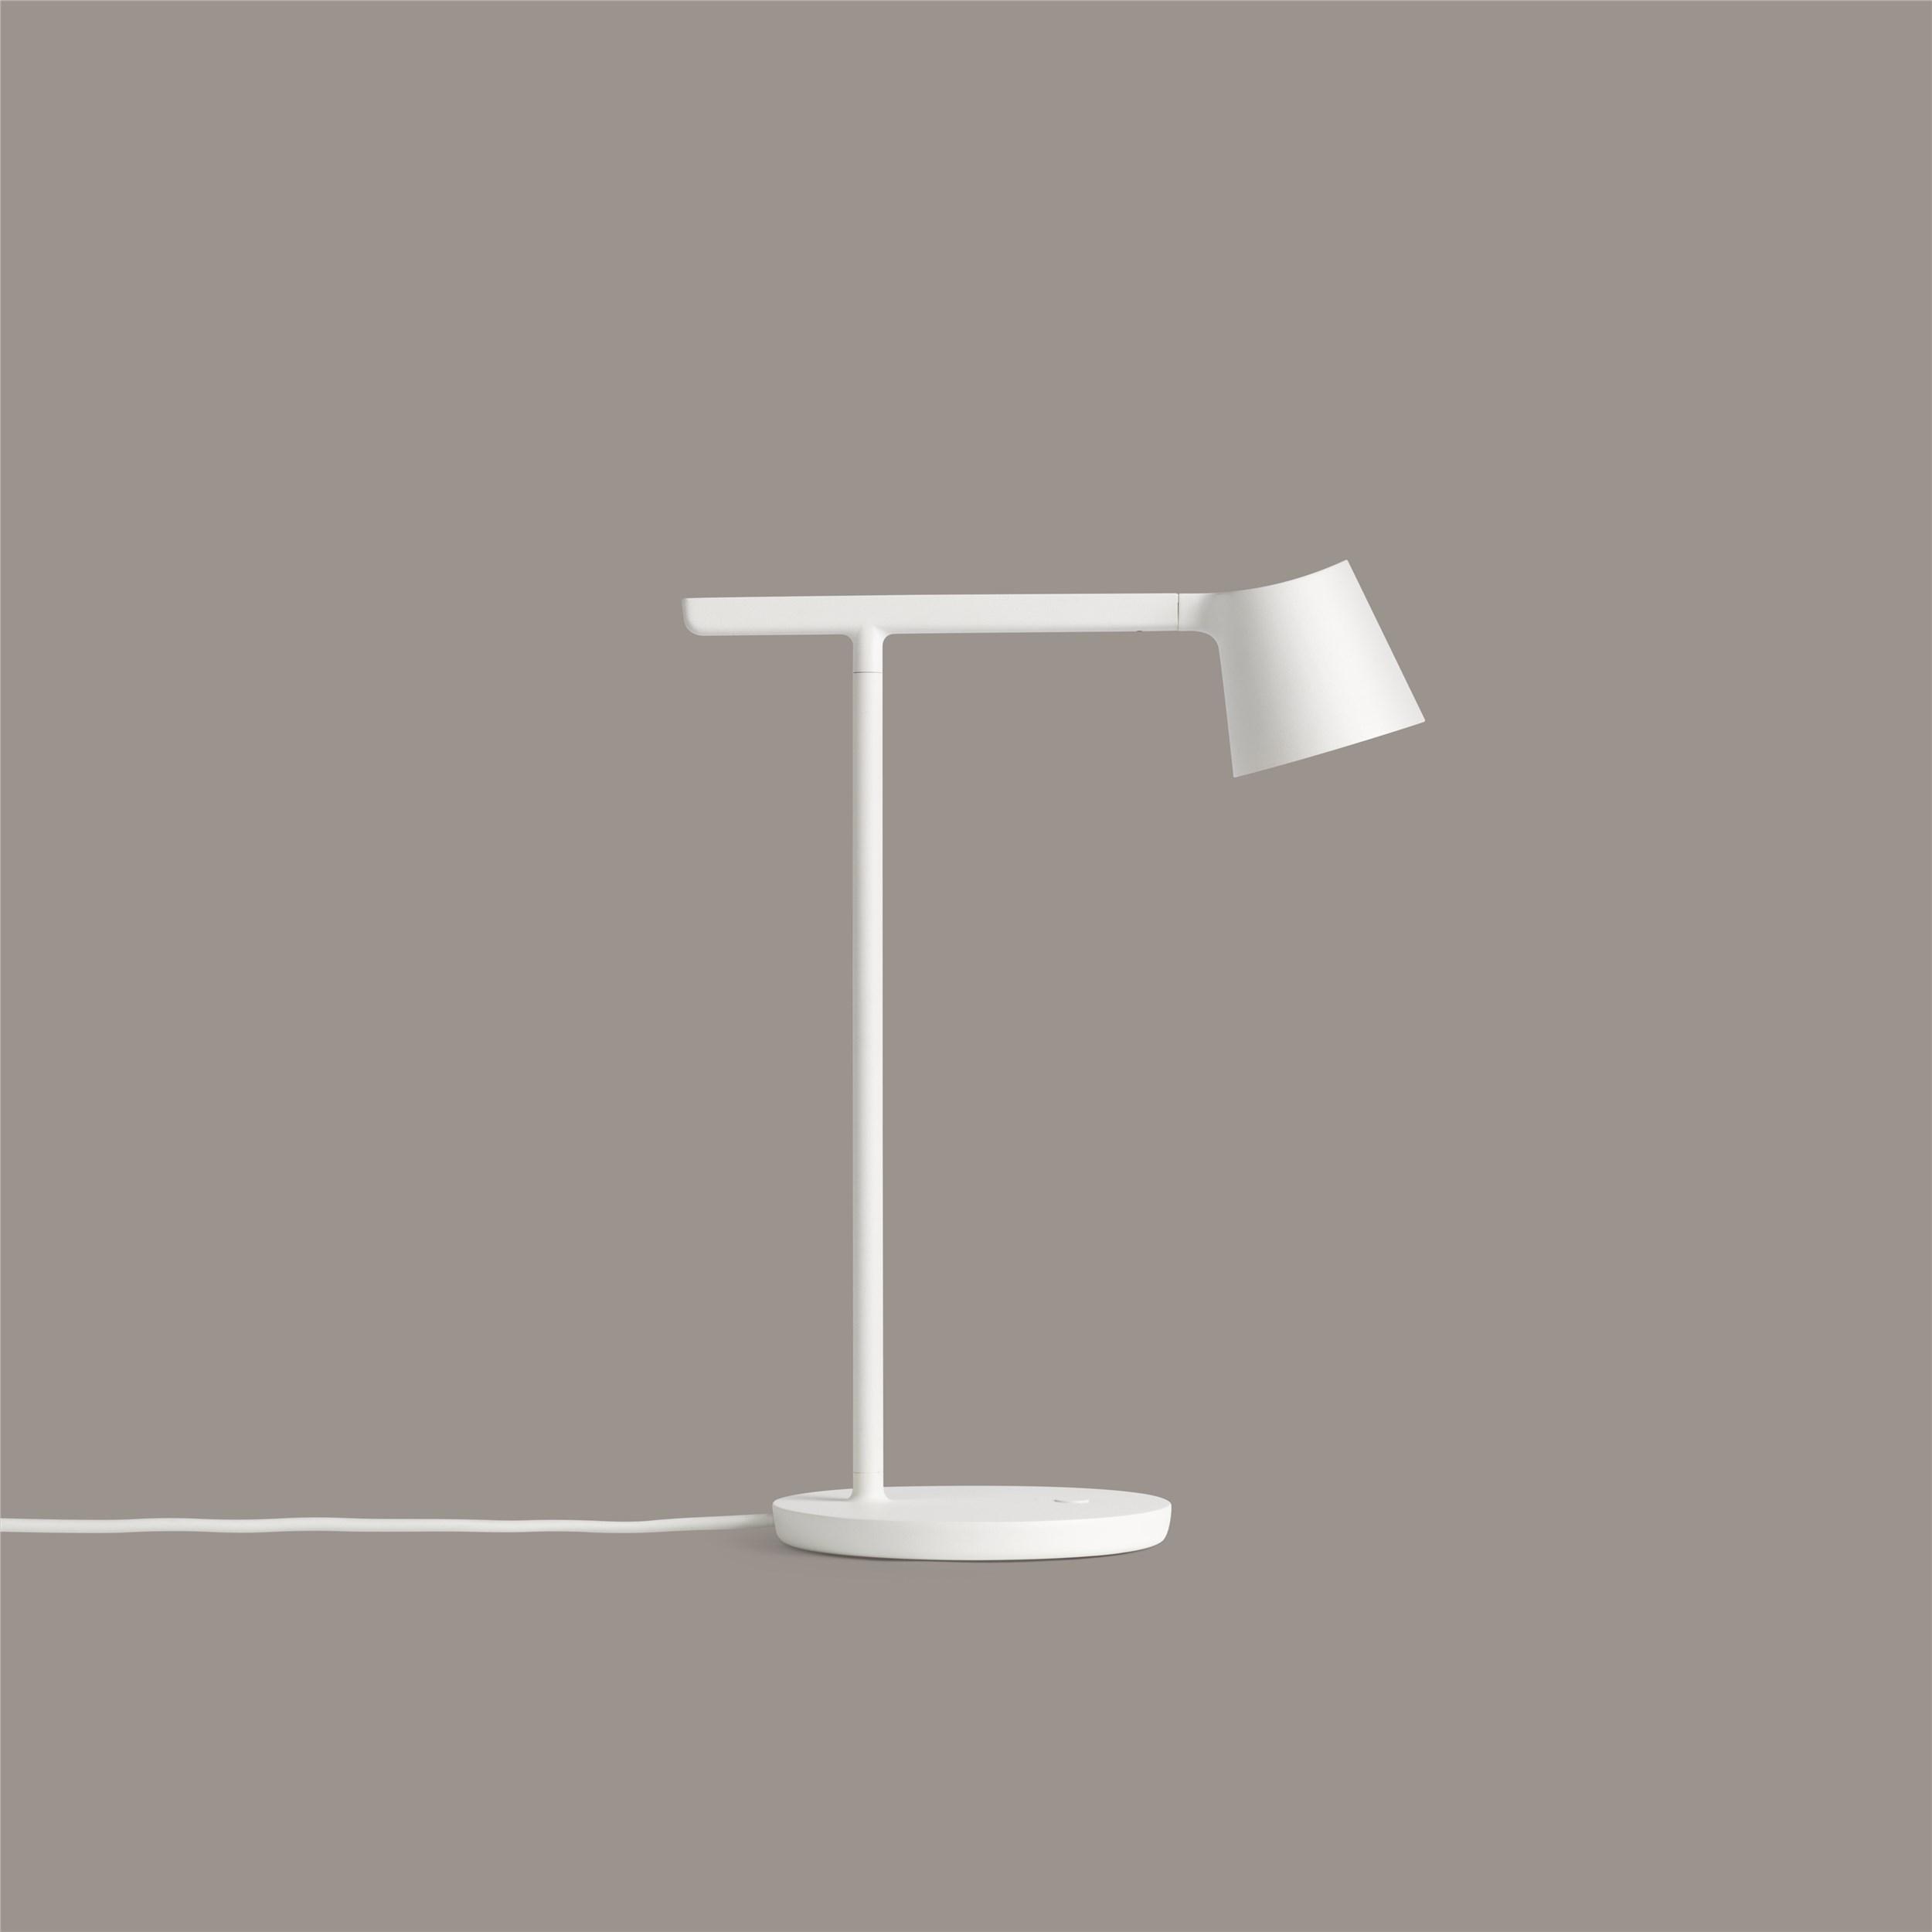 Tip table lamp white